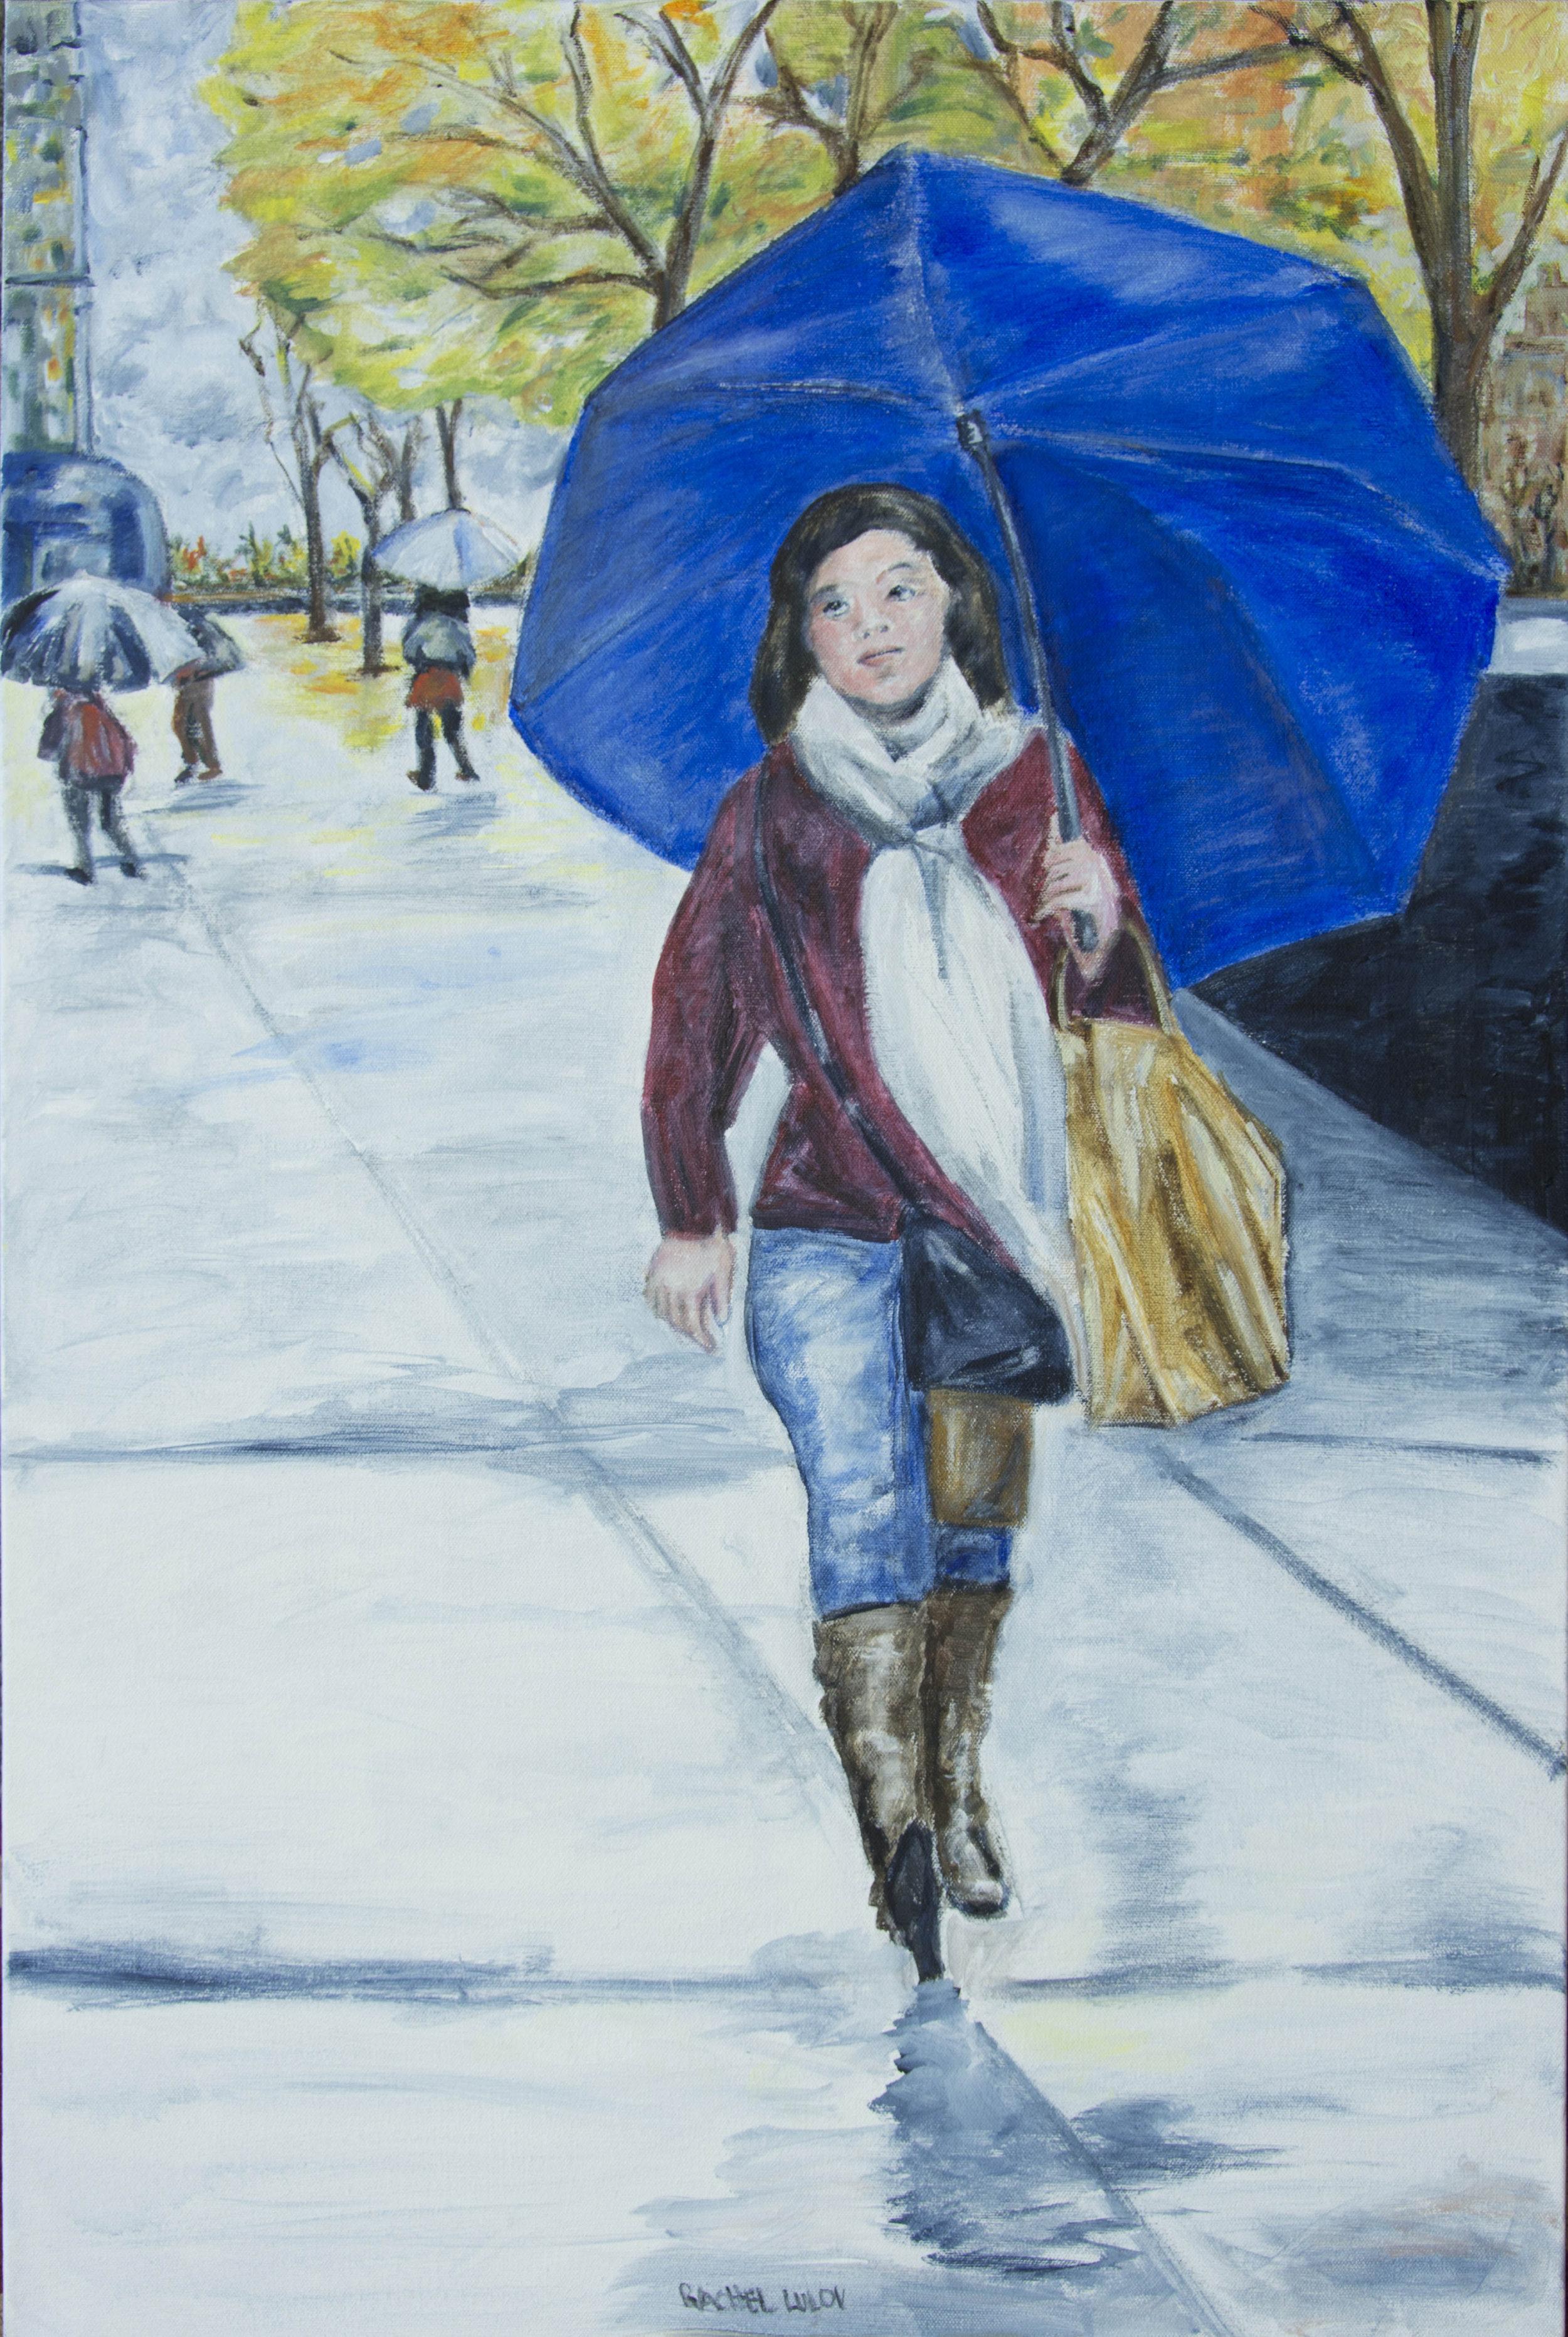 "Blue Umbrella acrylic on canvas 24"" x 36"" Rachel Lulov Segall"